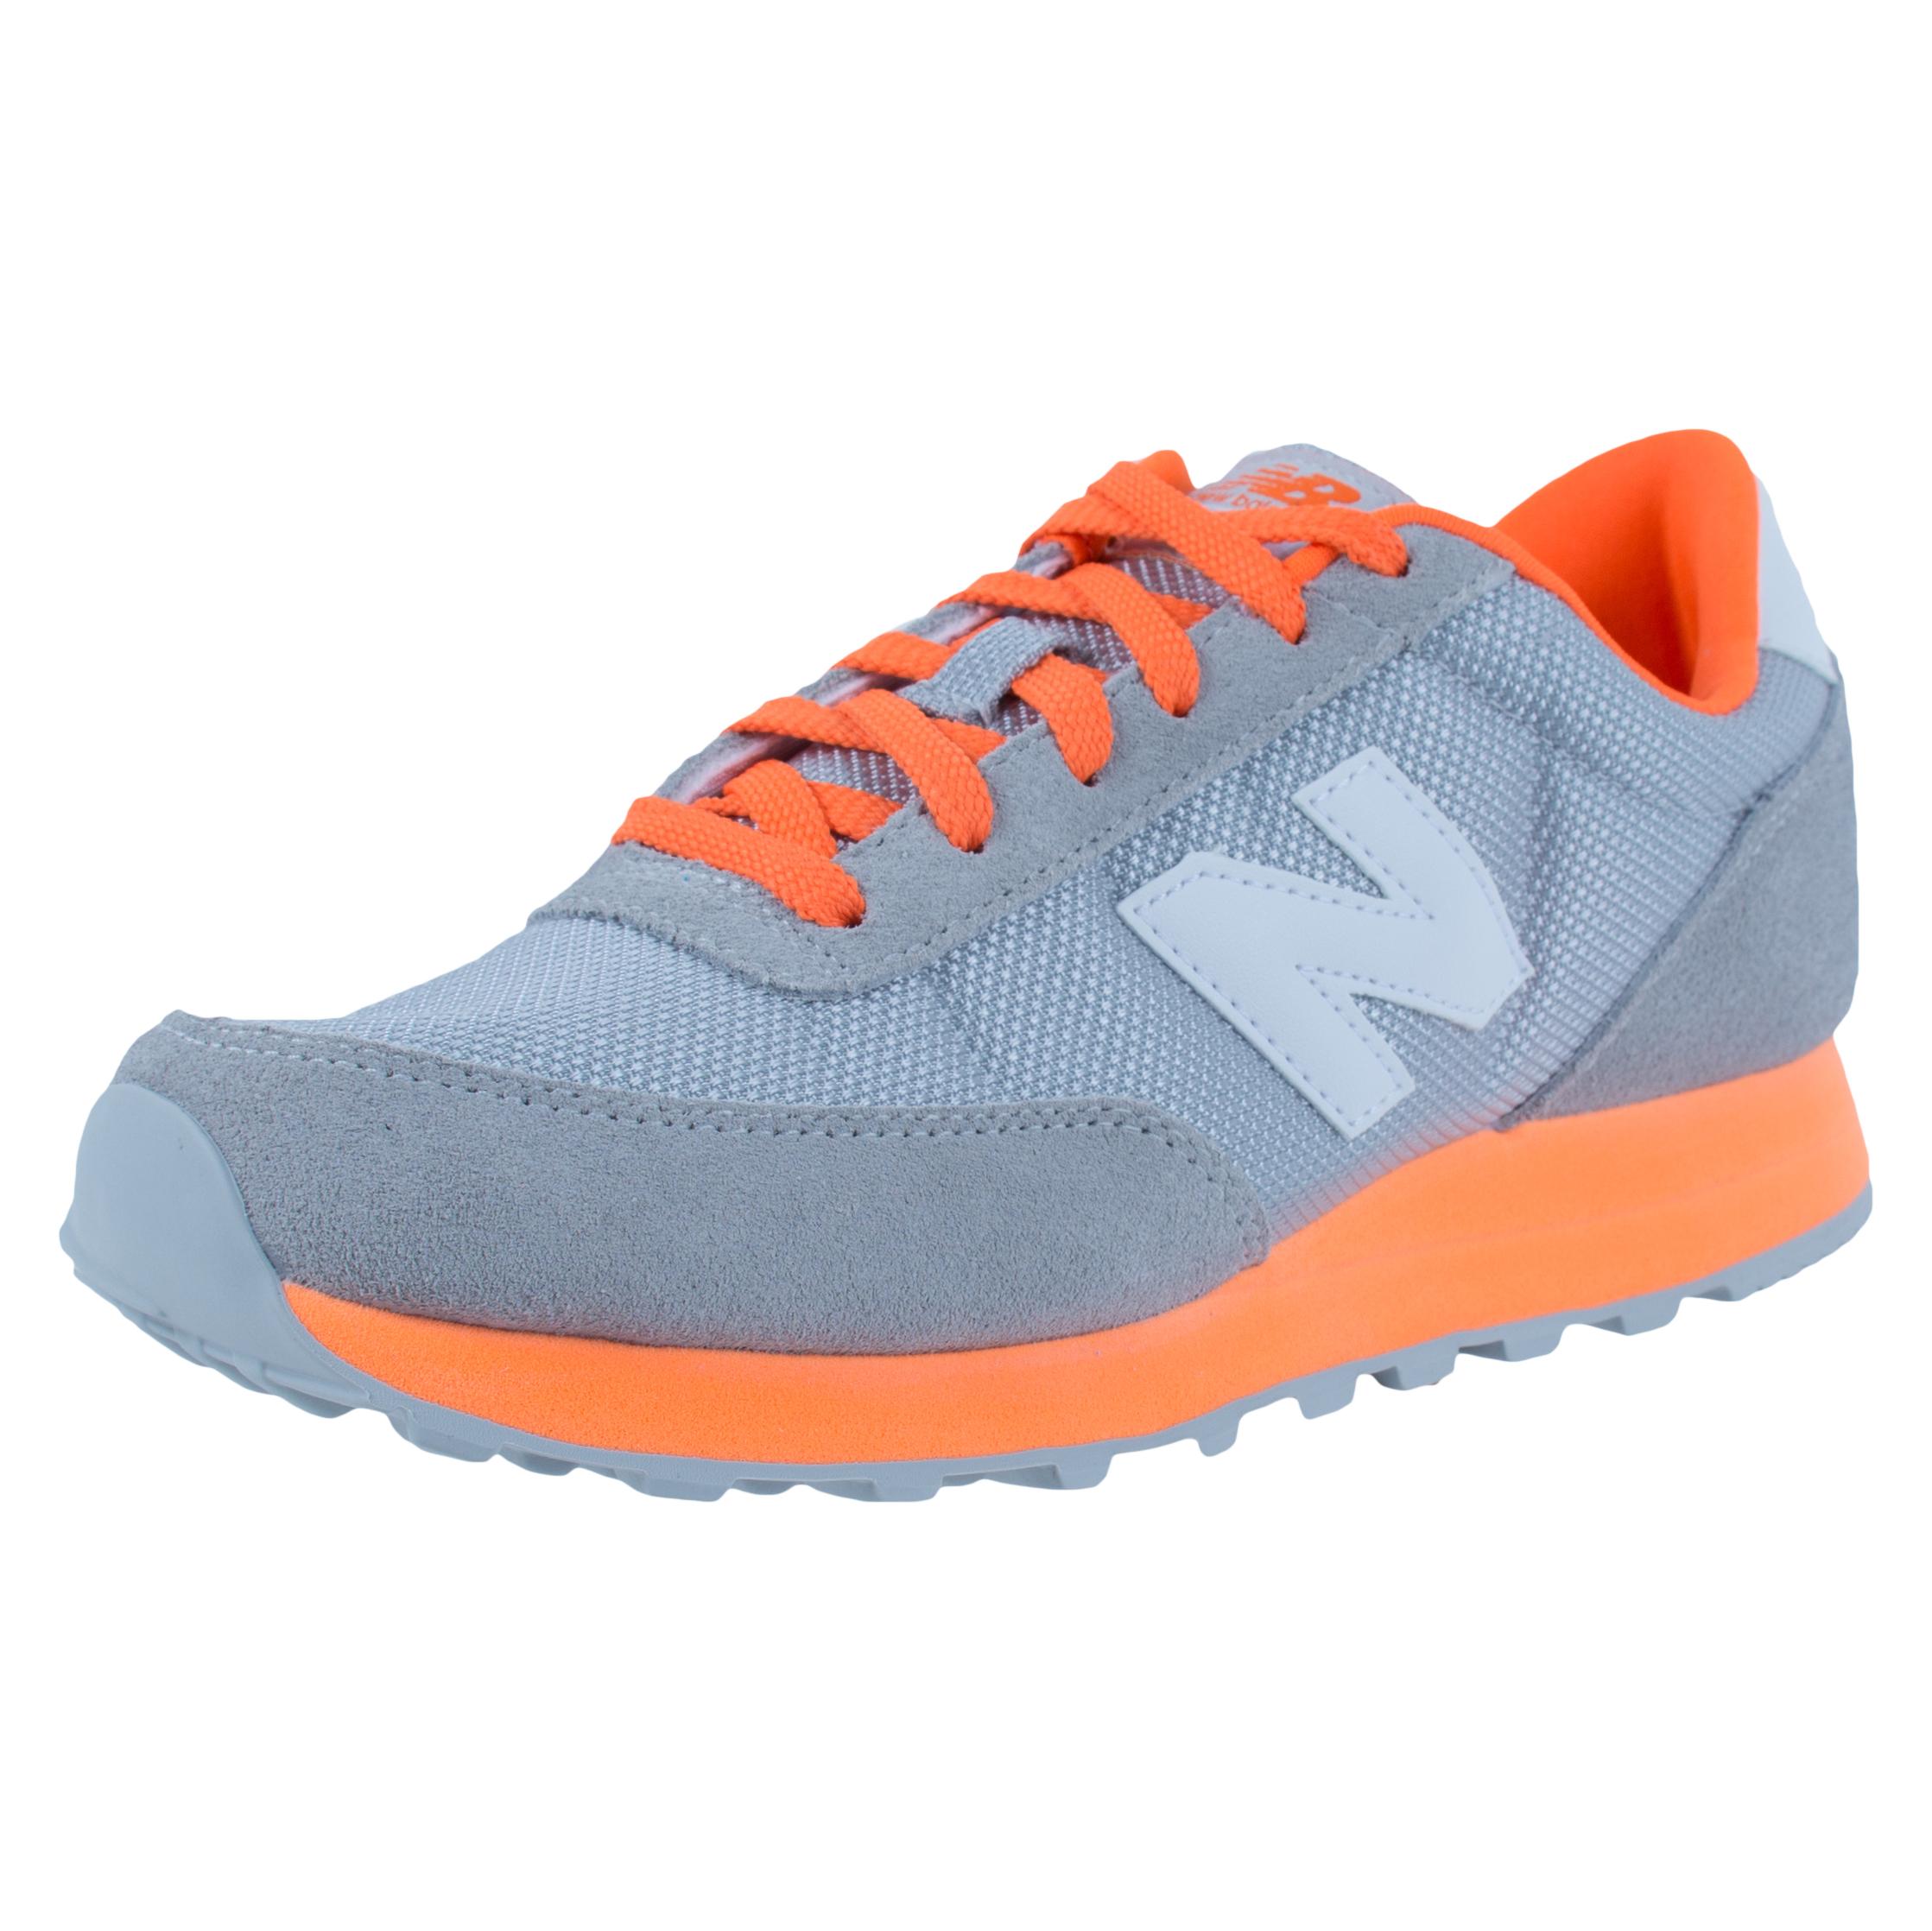 New Balance 501 naranja